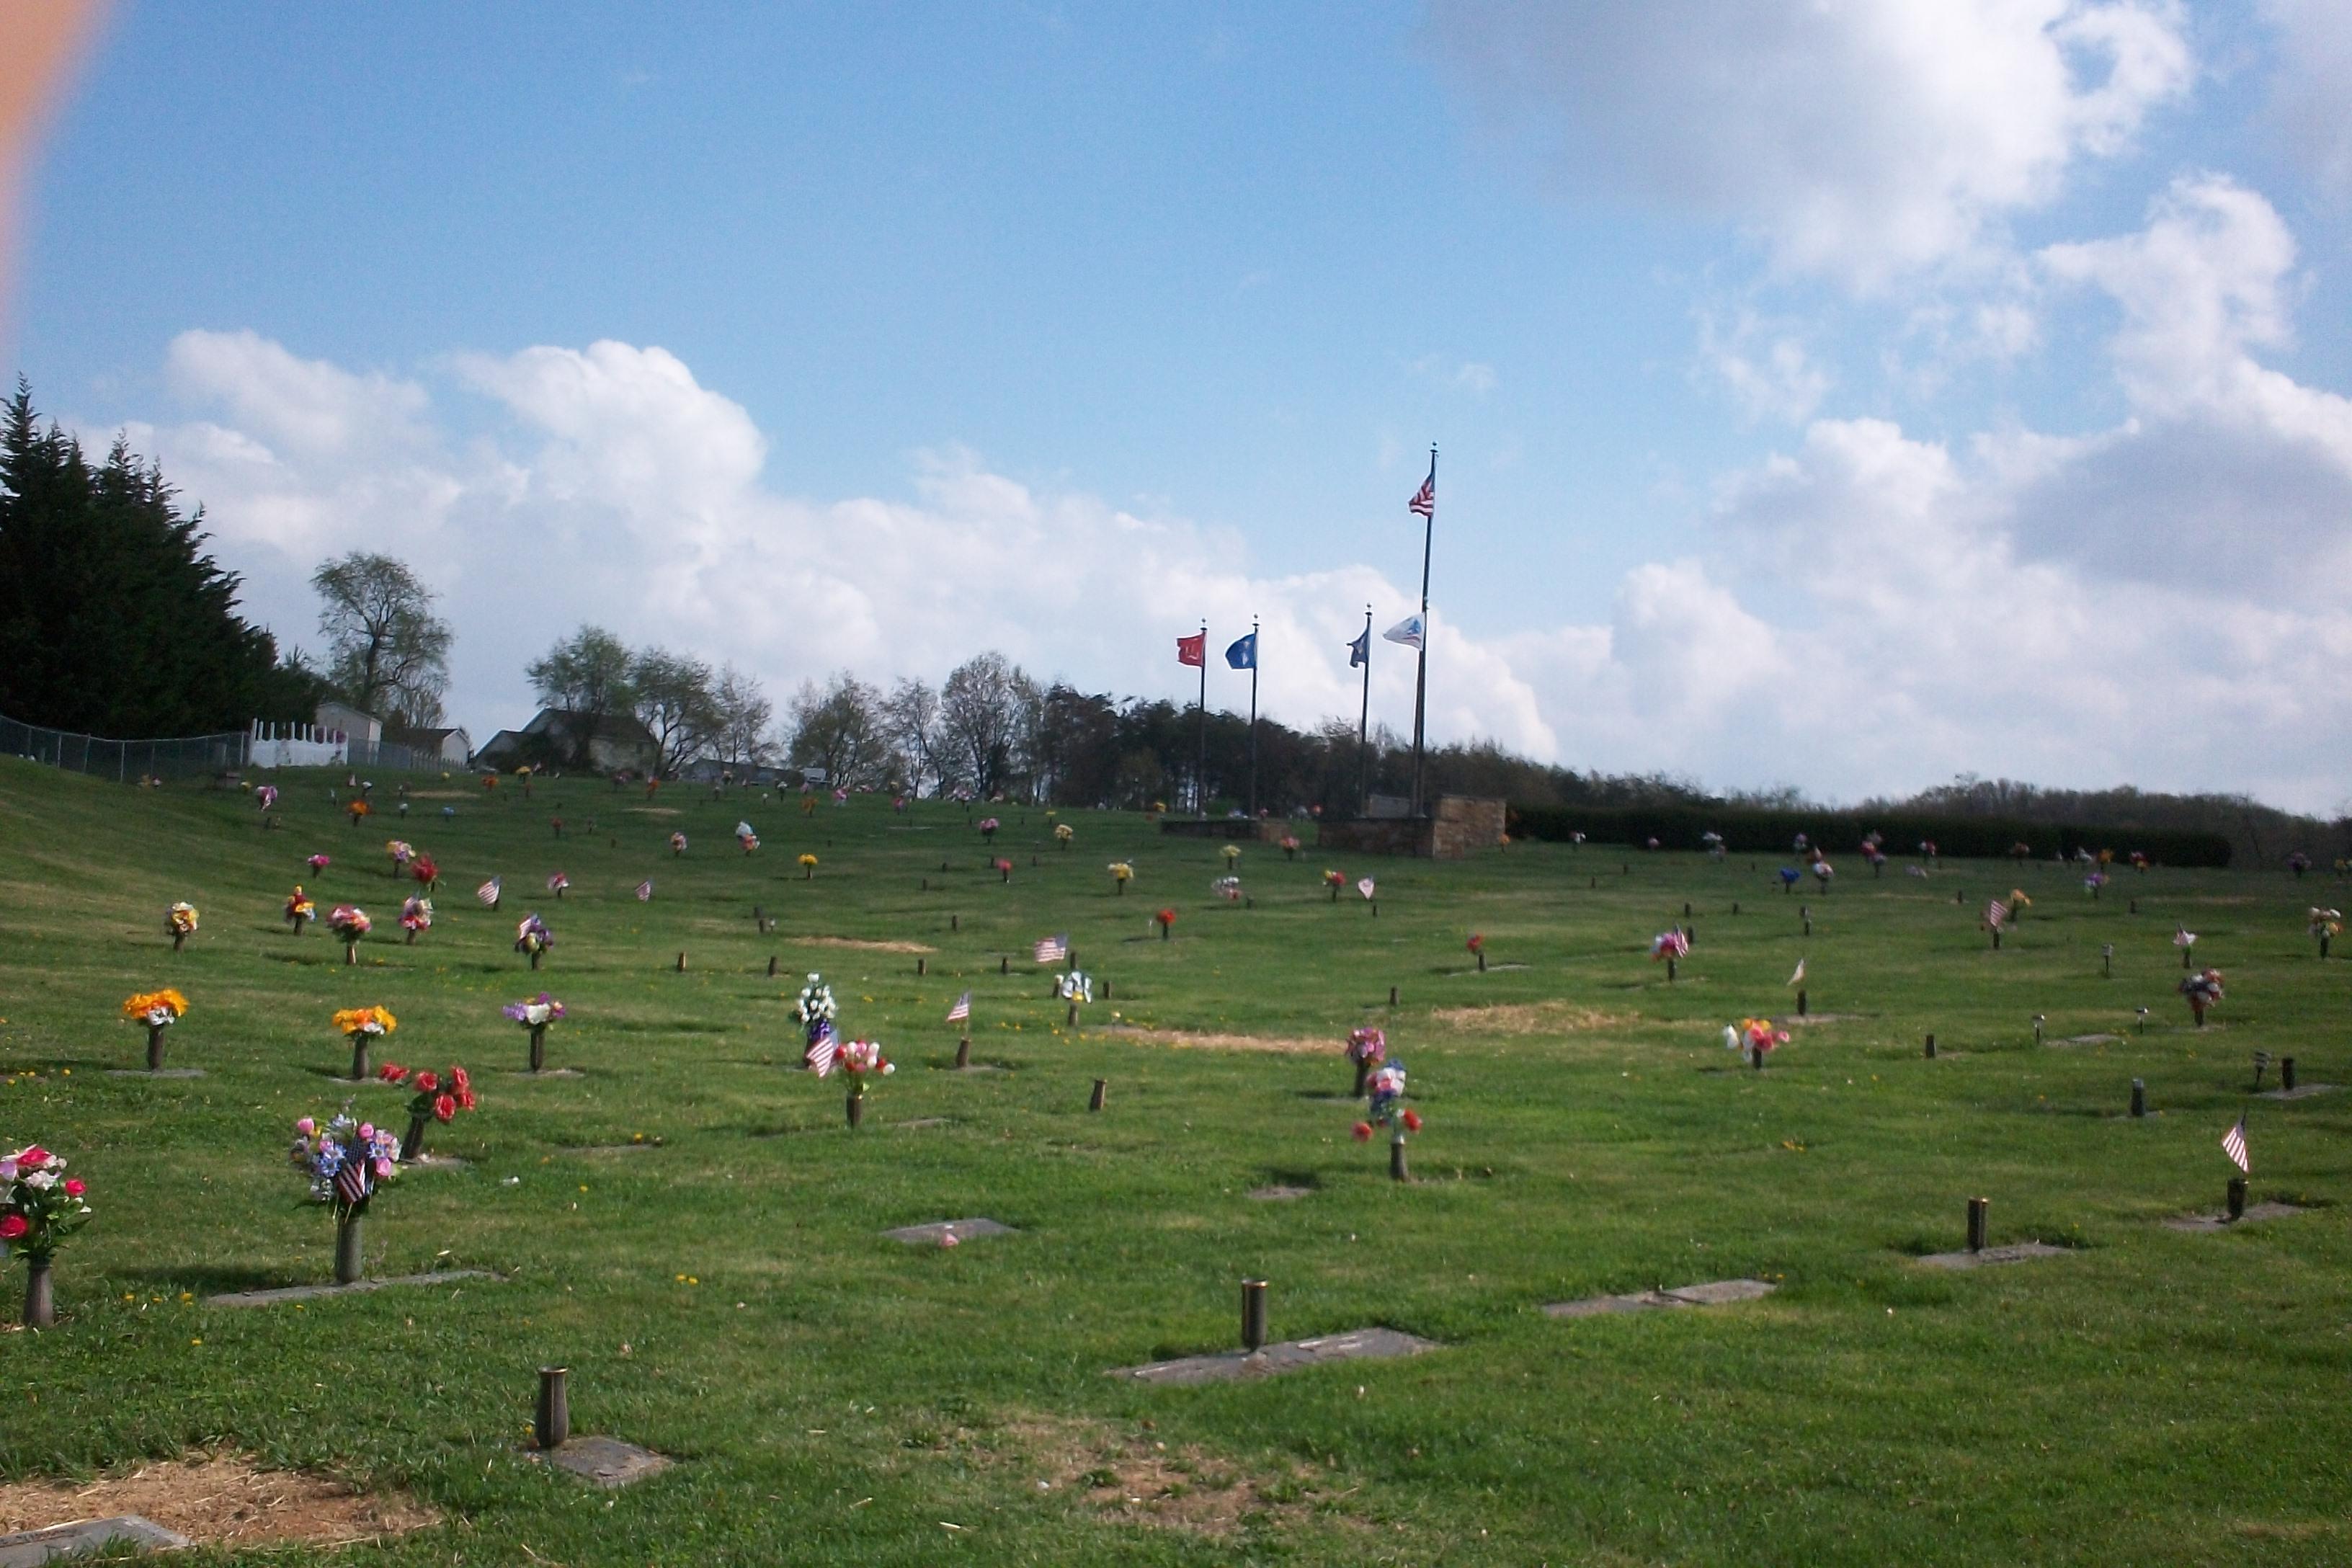 oaklawn mausoleum and memory garden in virginia